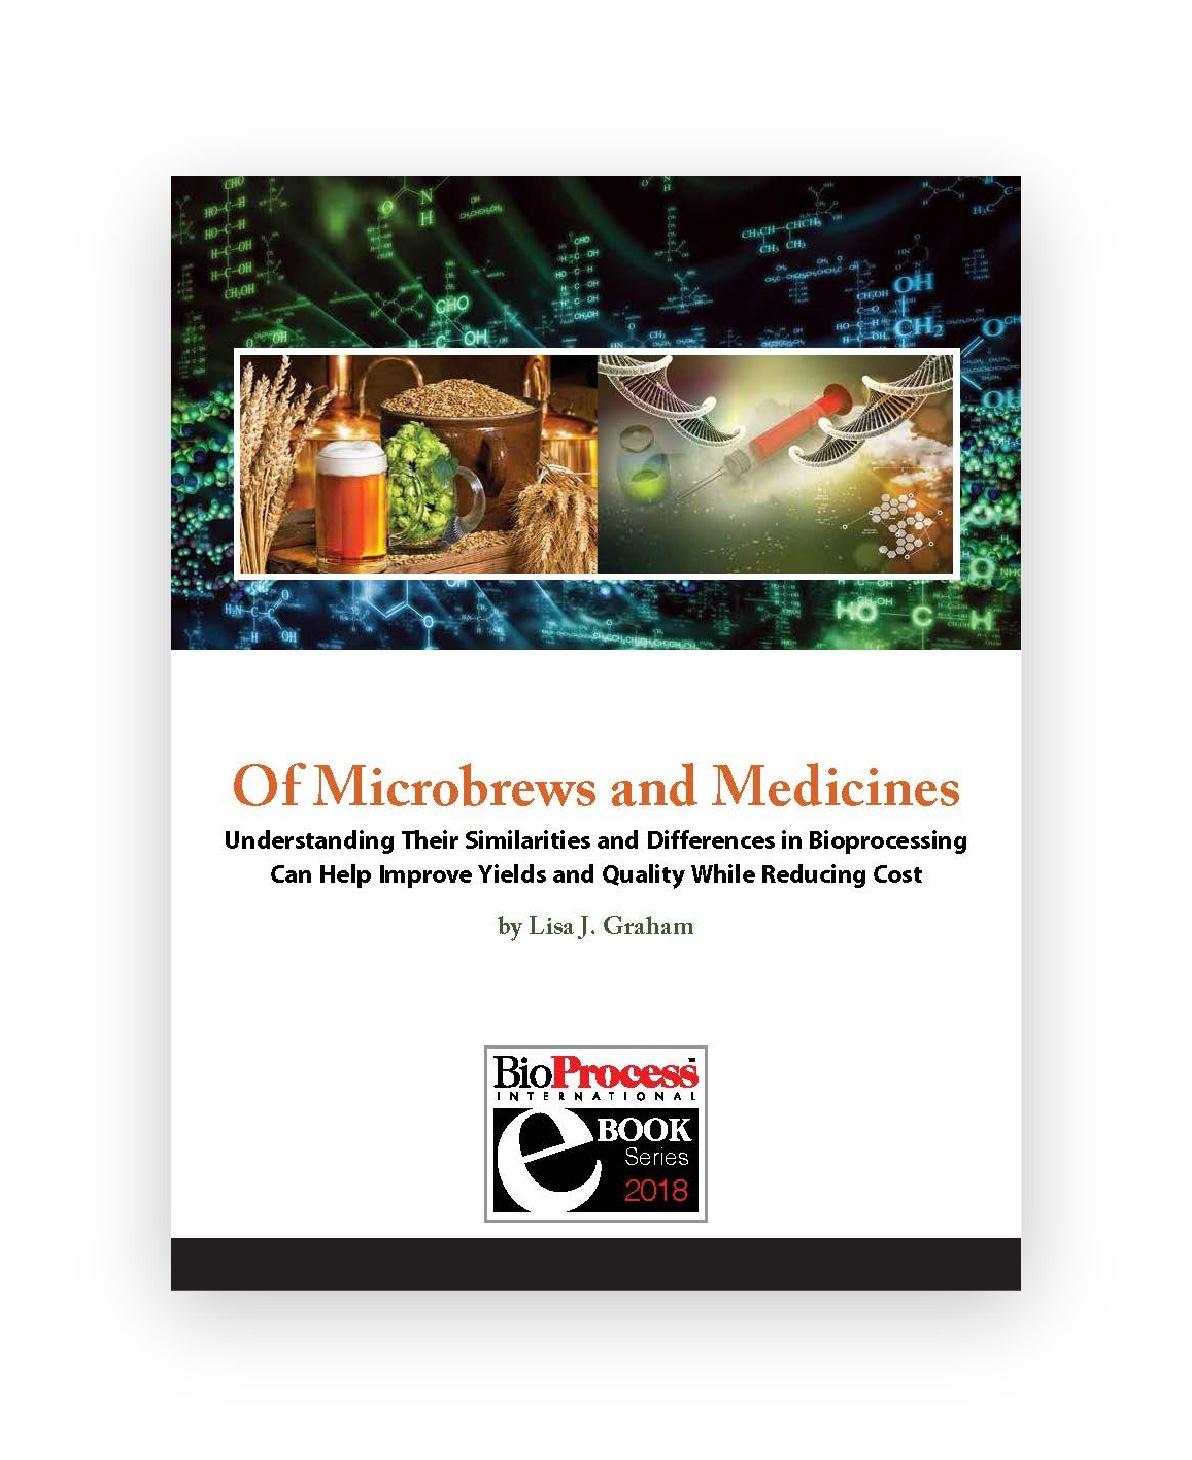 eBook - Of Microbrews and Medicines_NEW_300ppi.jpg